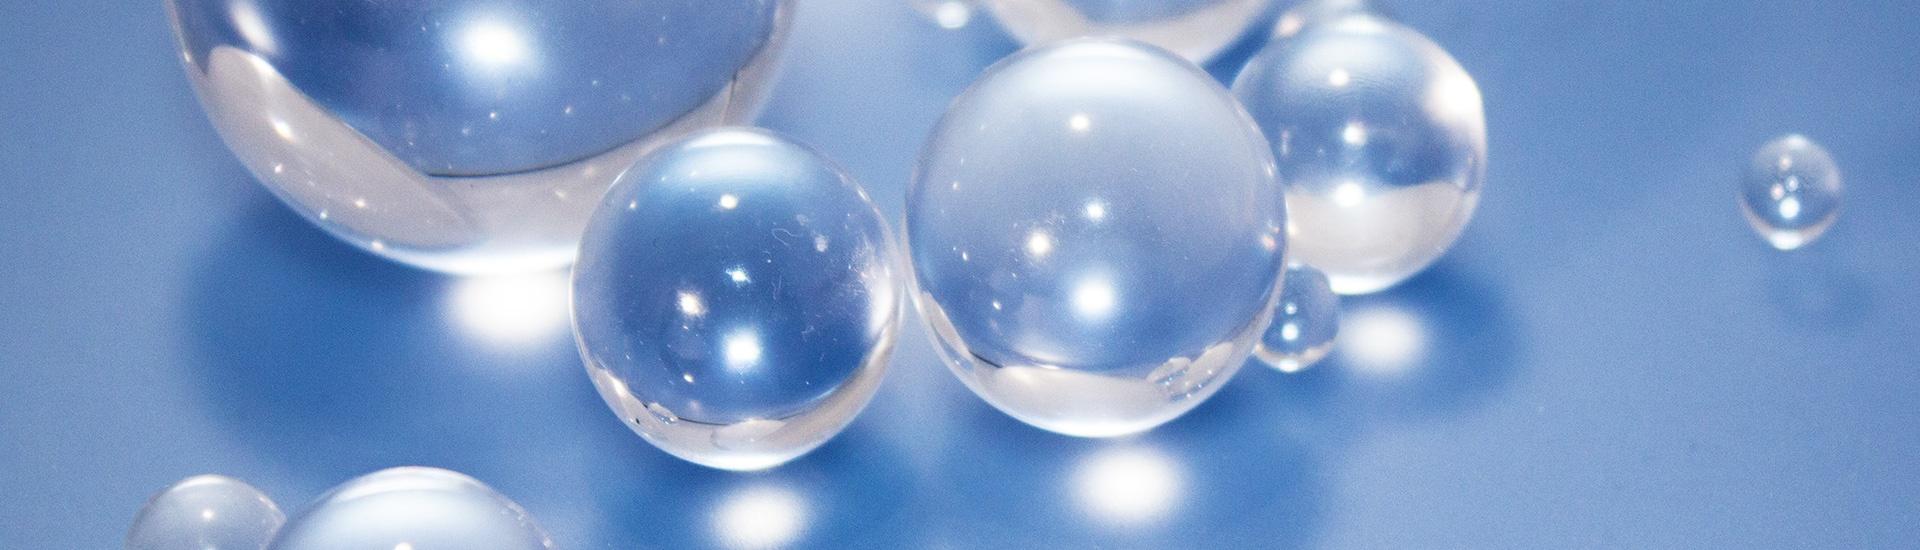 Sphères en PMMA